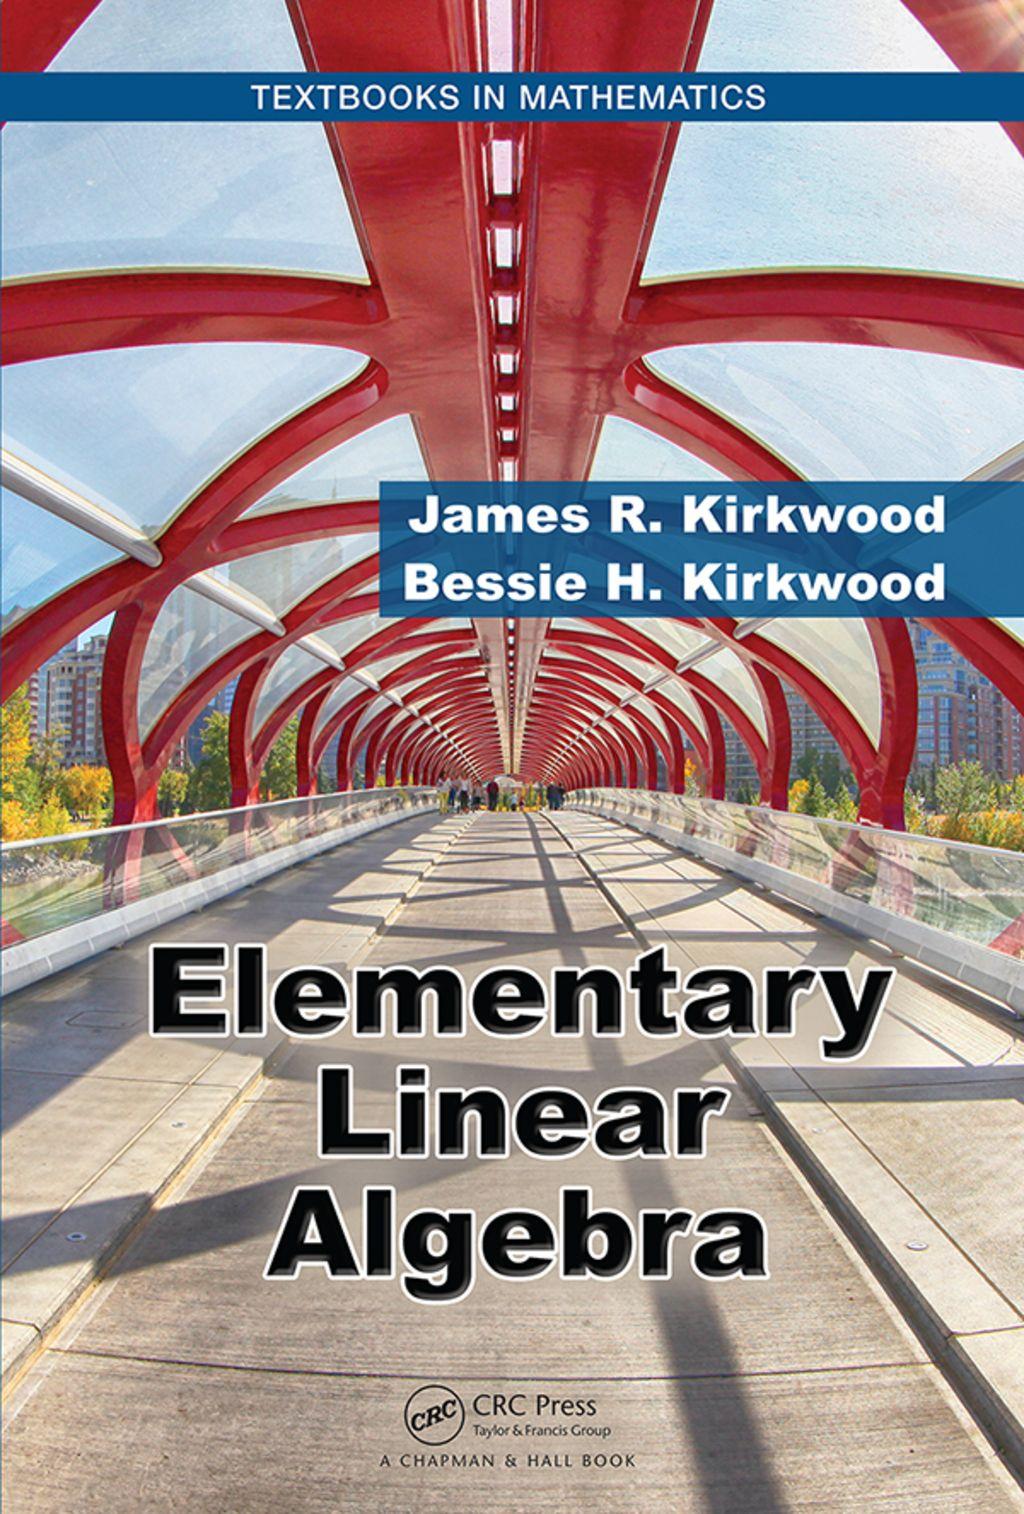 Elementary Linear Algebra Ebook Rental Algebra 1 Algebra